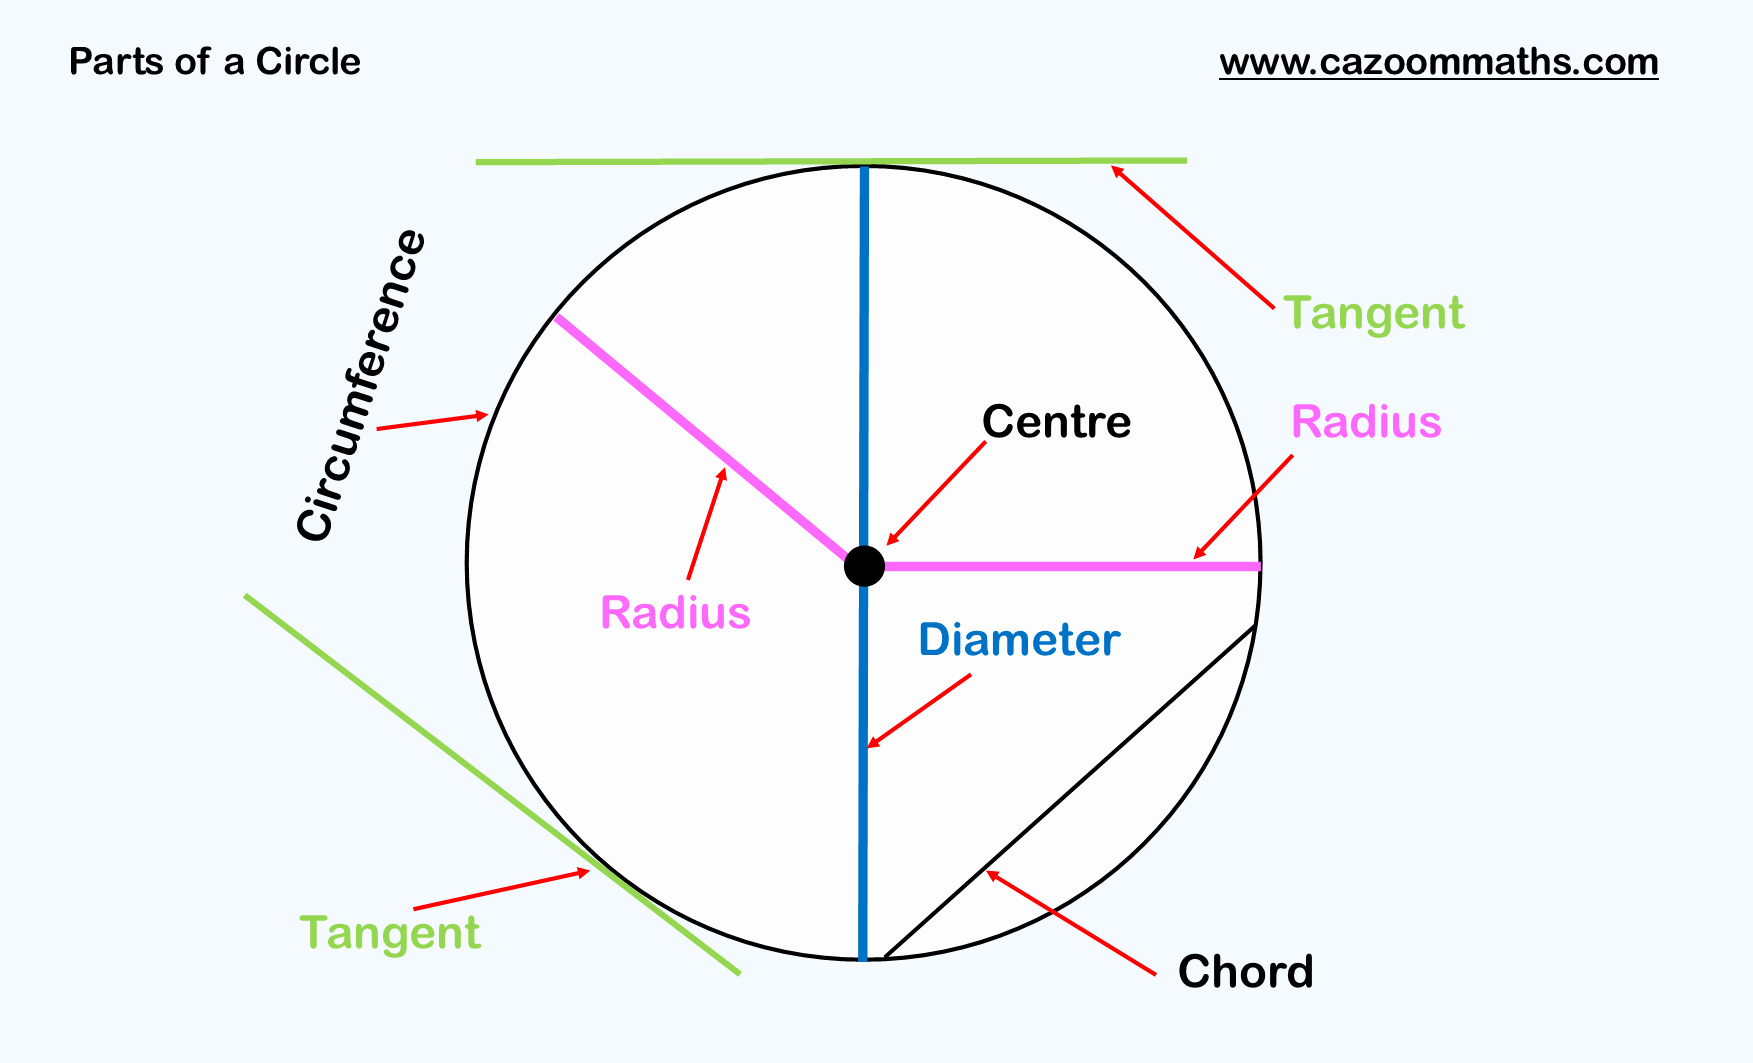 Parts Of A Circle Worksheet Elegant Cazoom Maths Worksheets Maths Worksheets